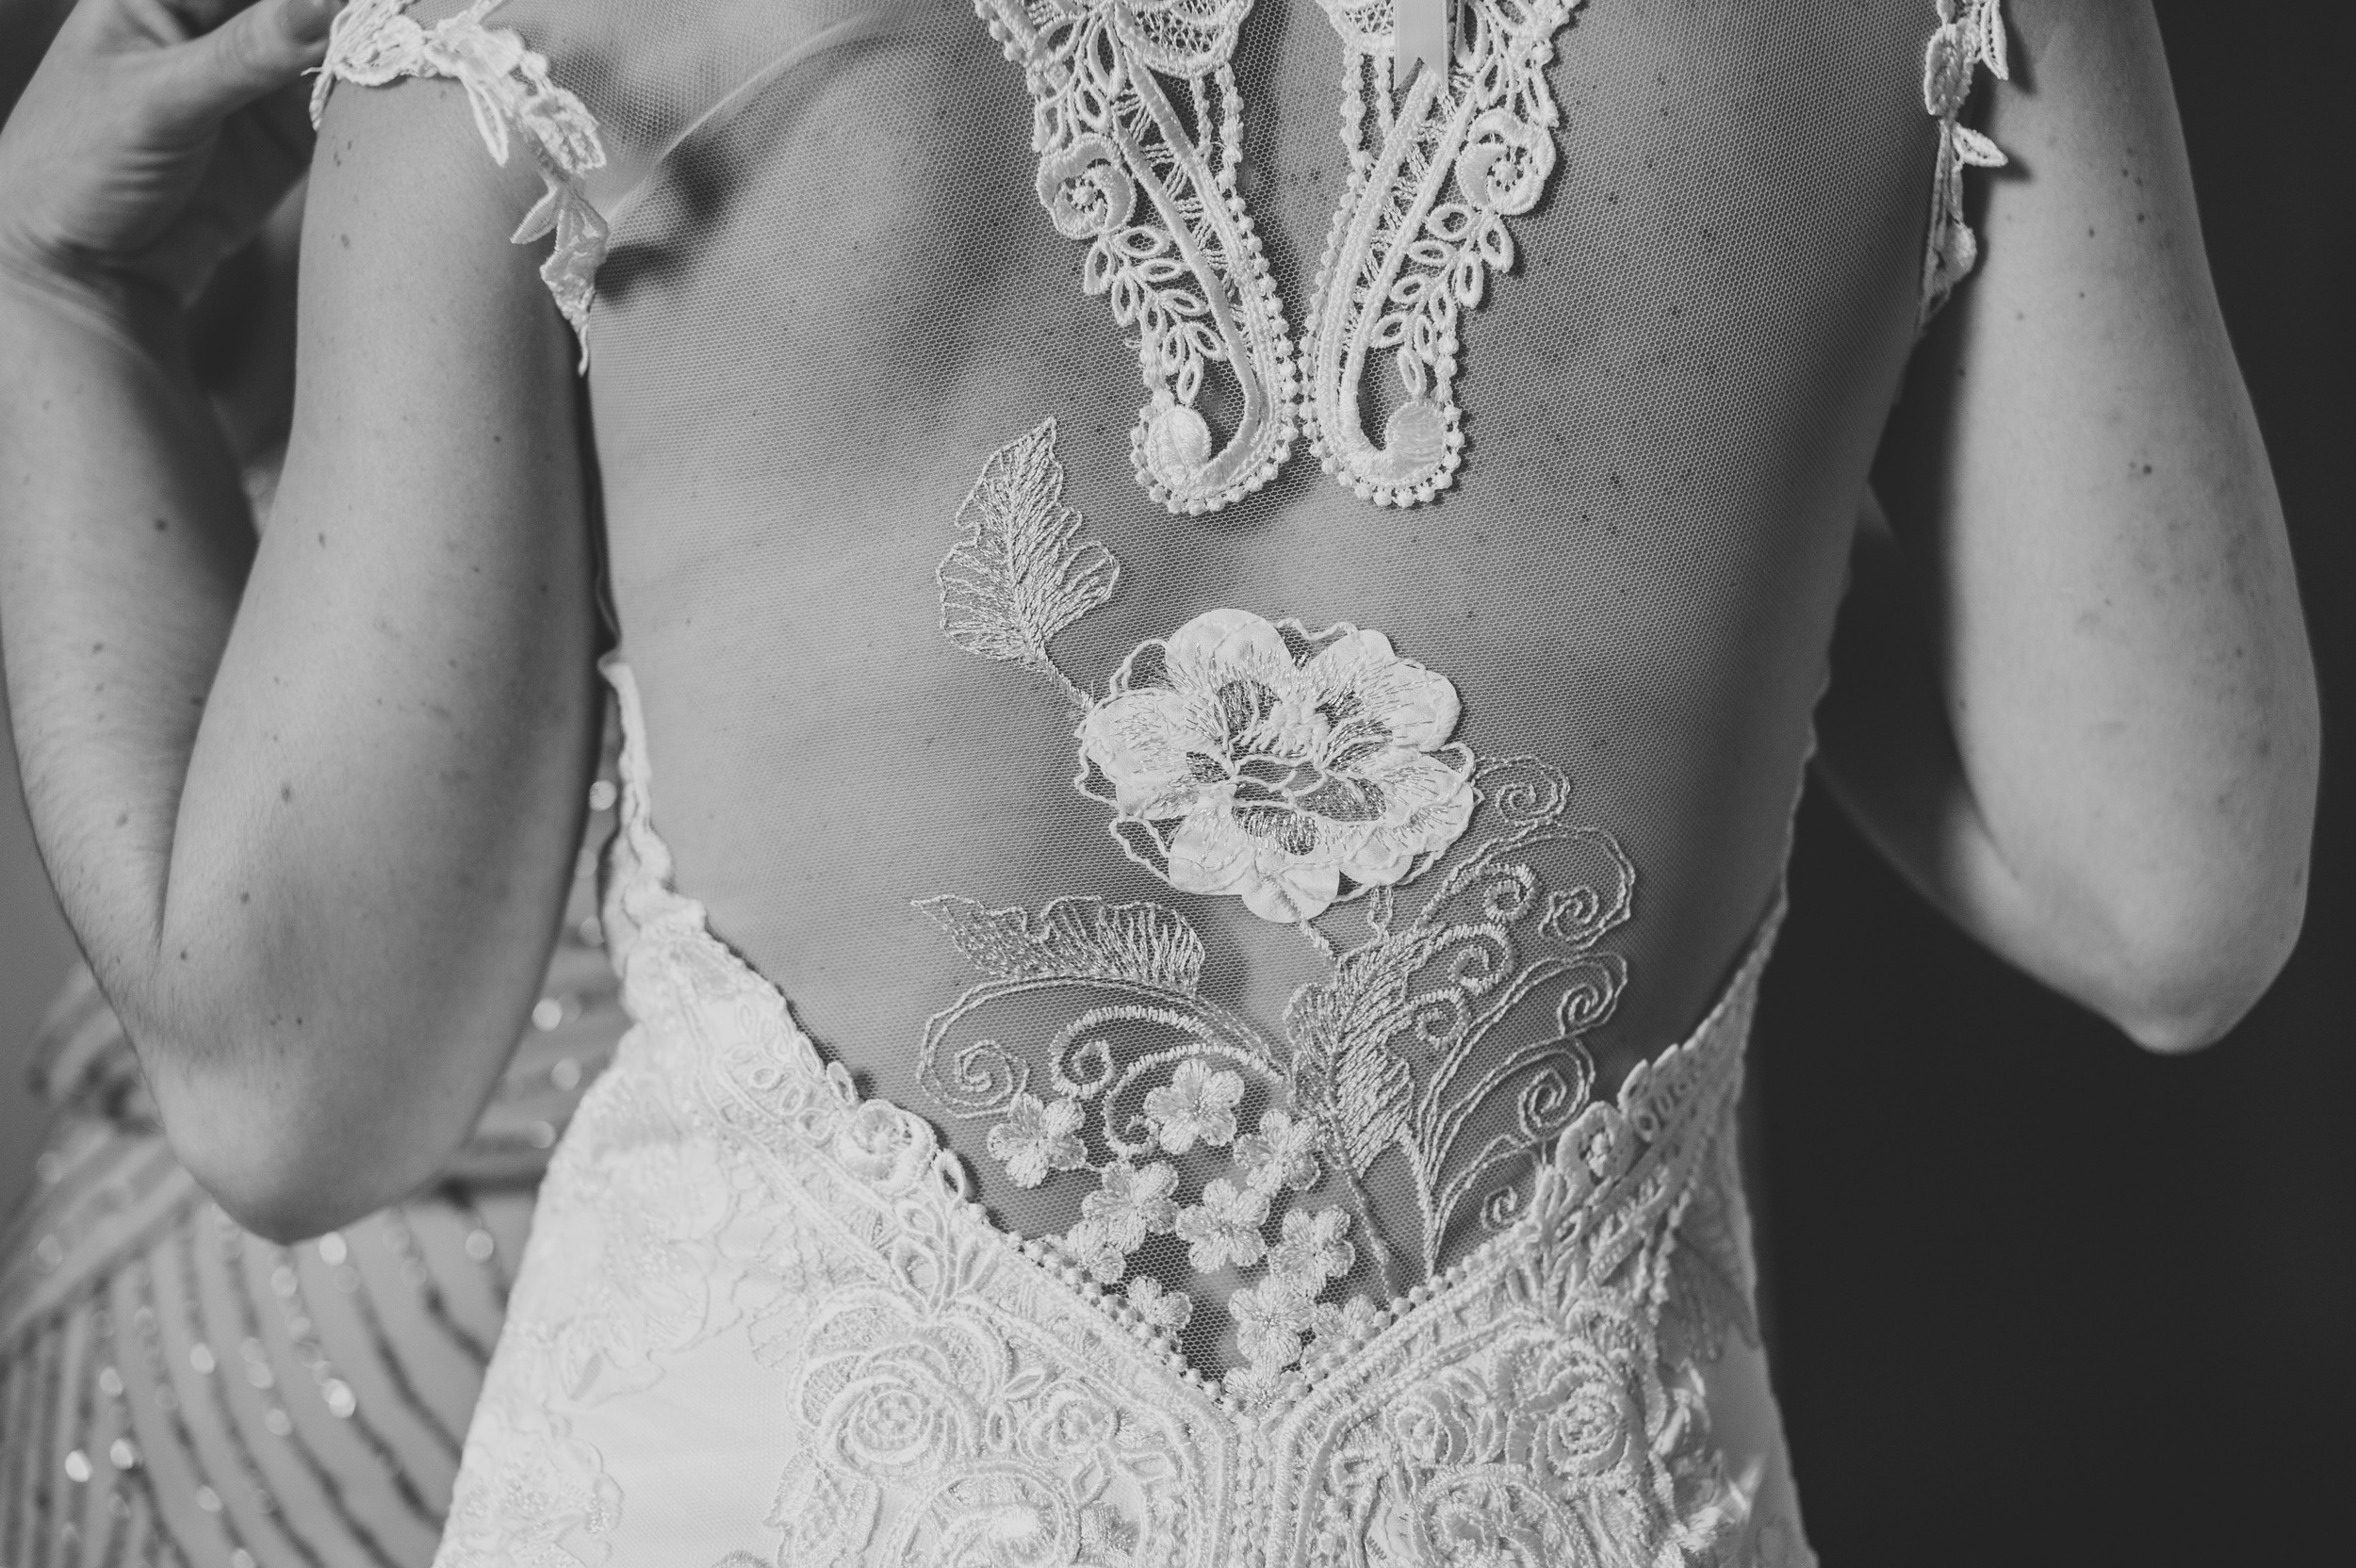 Lough Erne Resort Wedding Photography Northern Ireland 018.JPG